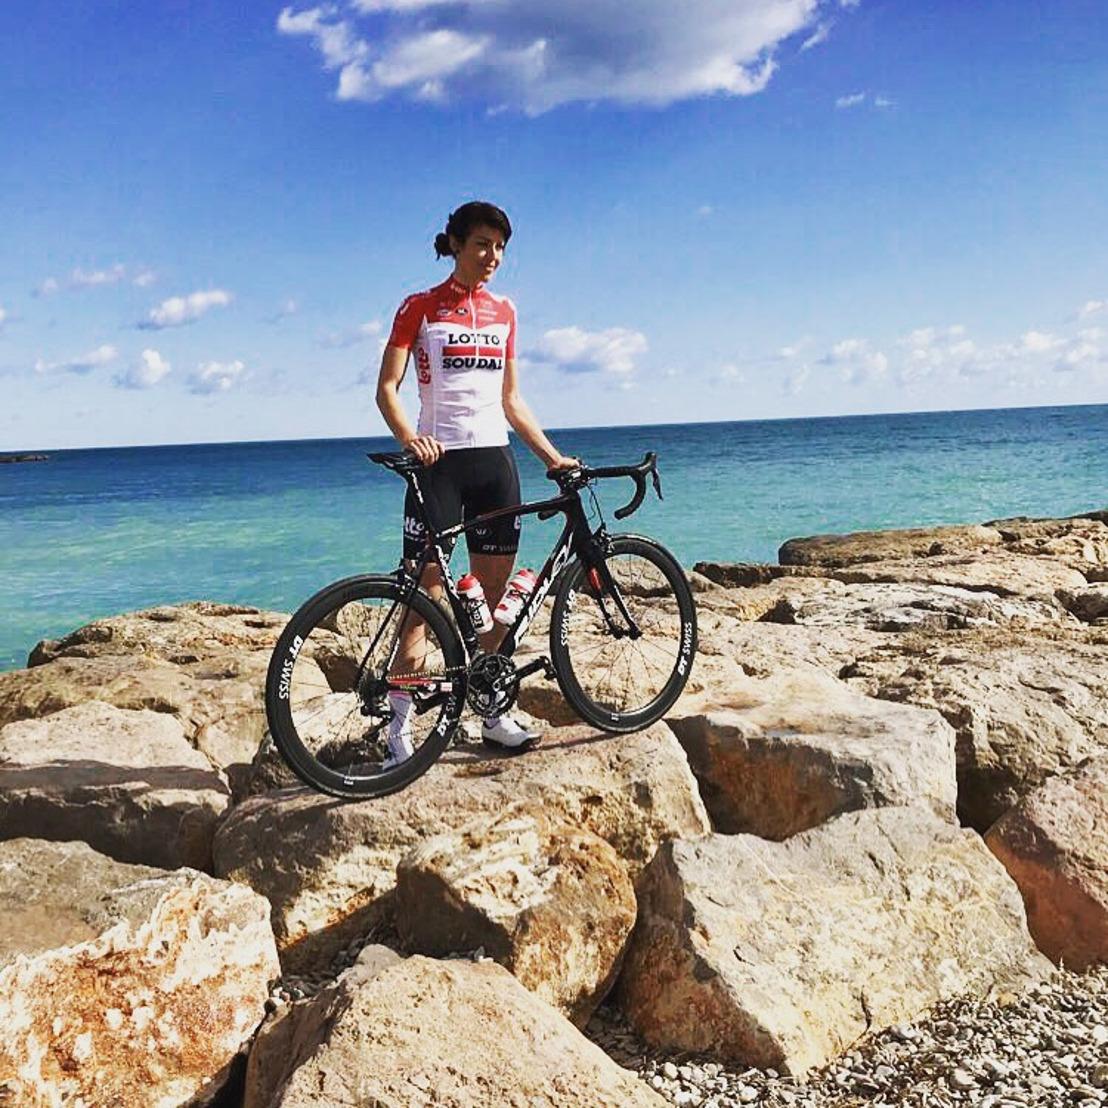 SKODA België start samenwerking met wielrenster Isabelle Beckers